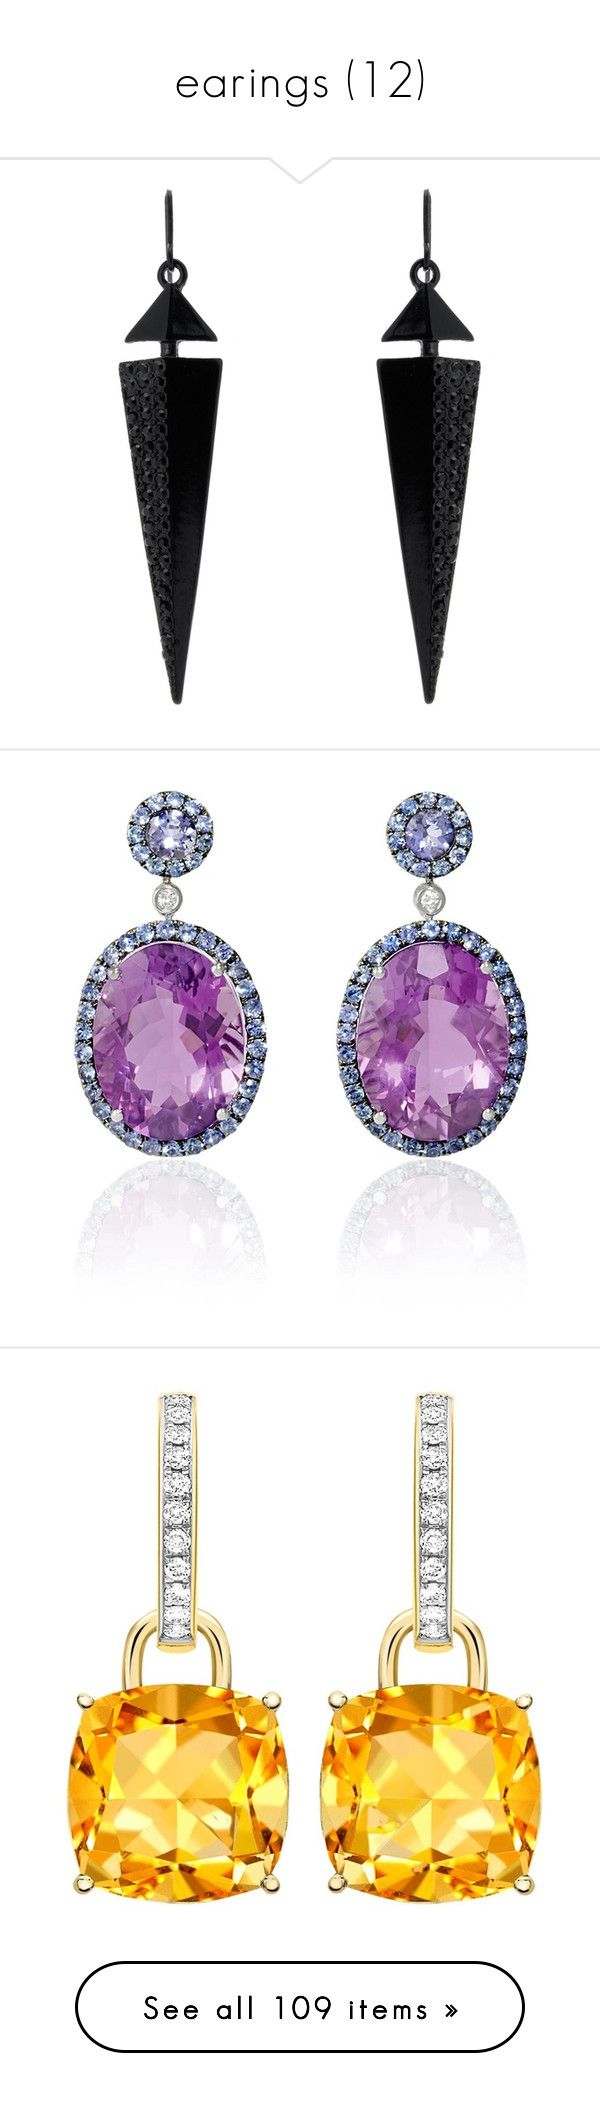 """earings (12)"" by geniusmermaid on Polyvore featuring jewelry, earrings, accessories, brincos, black, drop earrings, earring jewelry, purple earrings, long diamond earrings and blue sapphire dangle earrings"